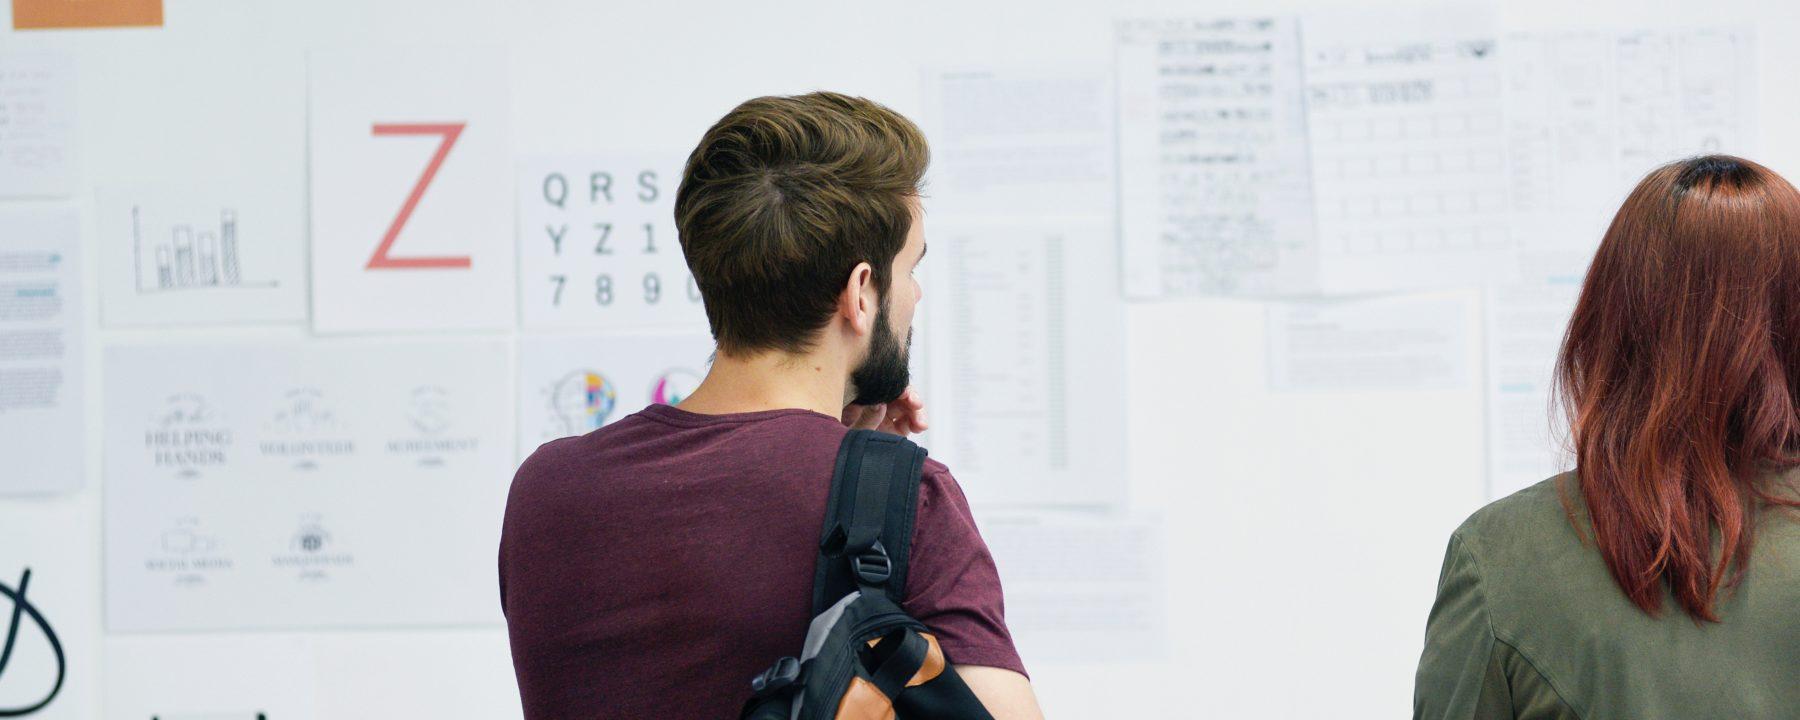 Siemens Wind Power Hackathon Innovation Lab